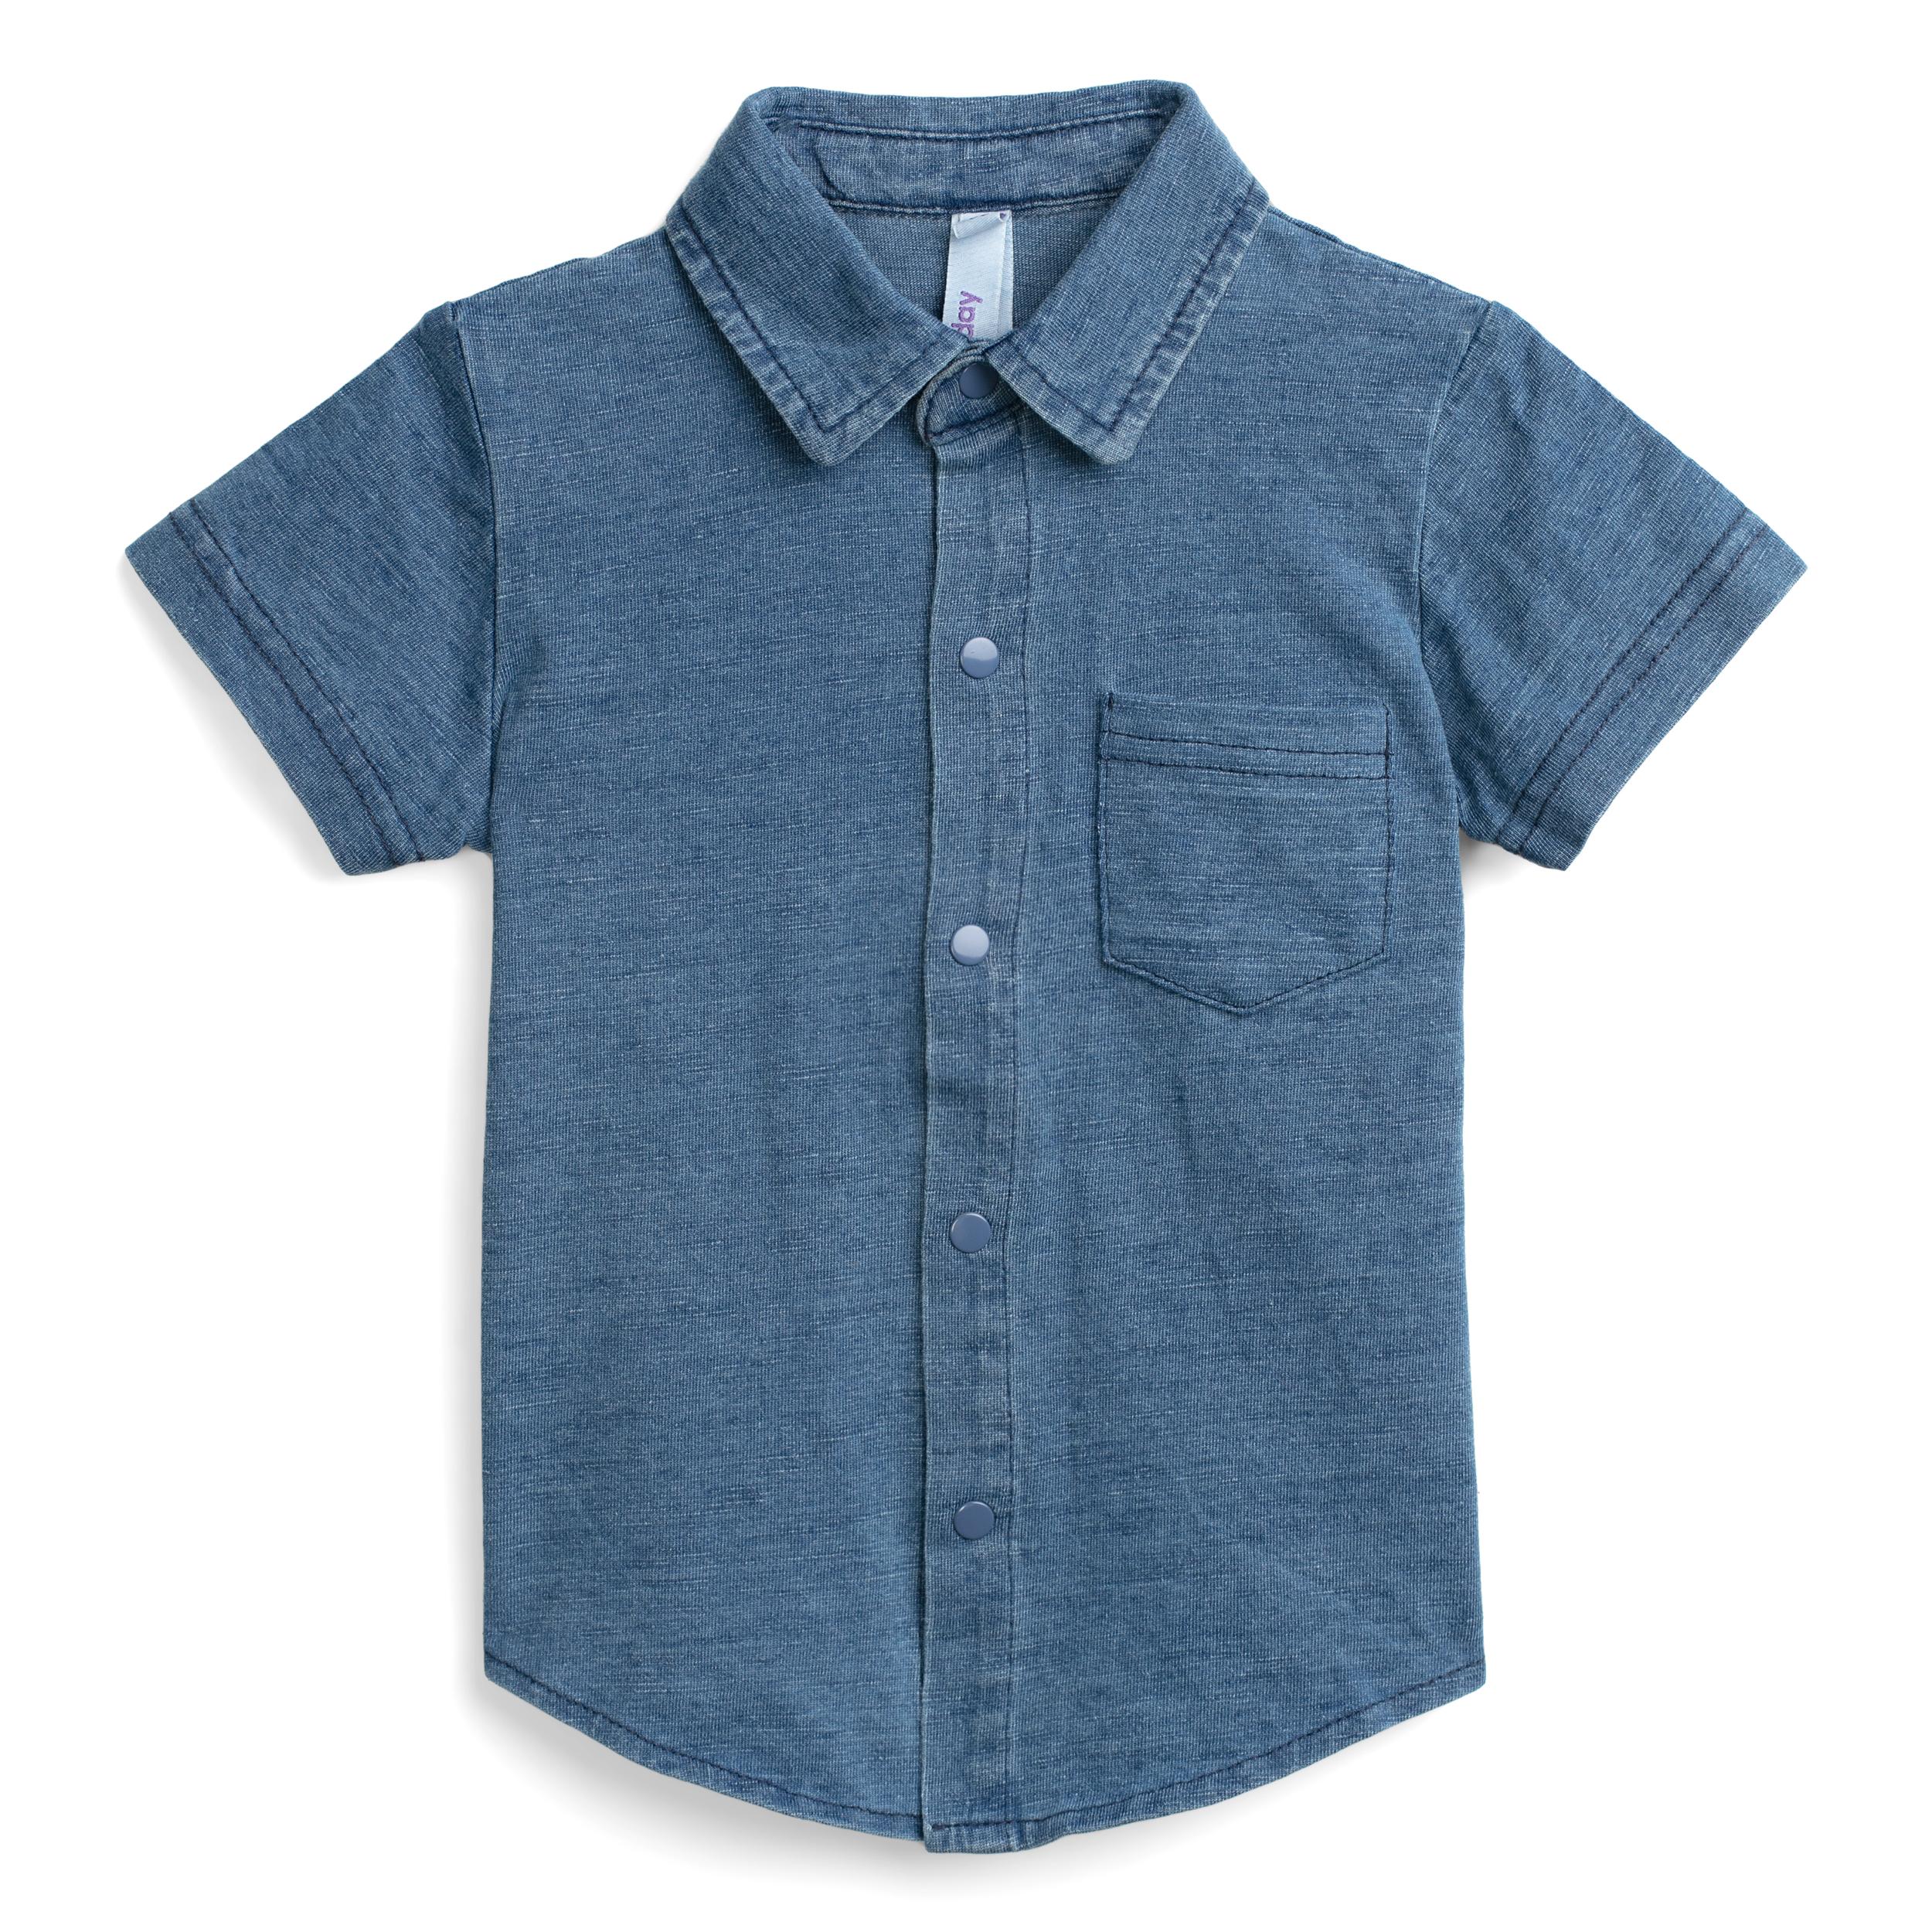 все цены на Рубашка PlayToday онлайн